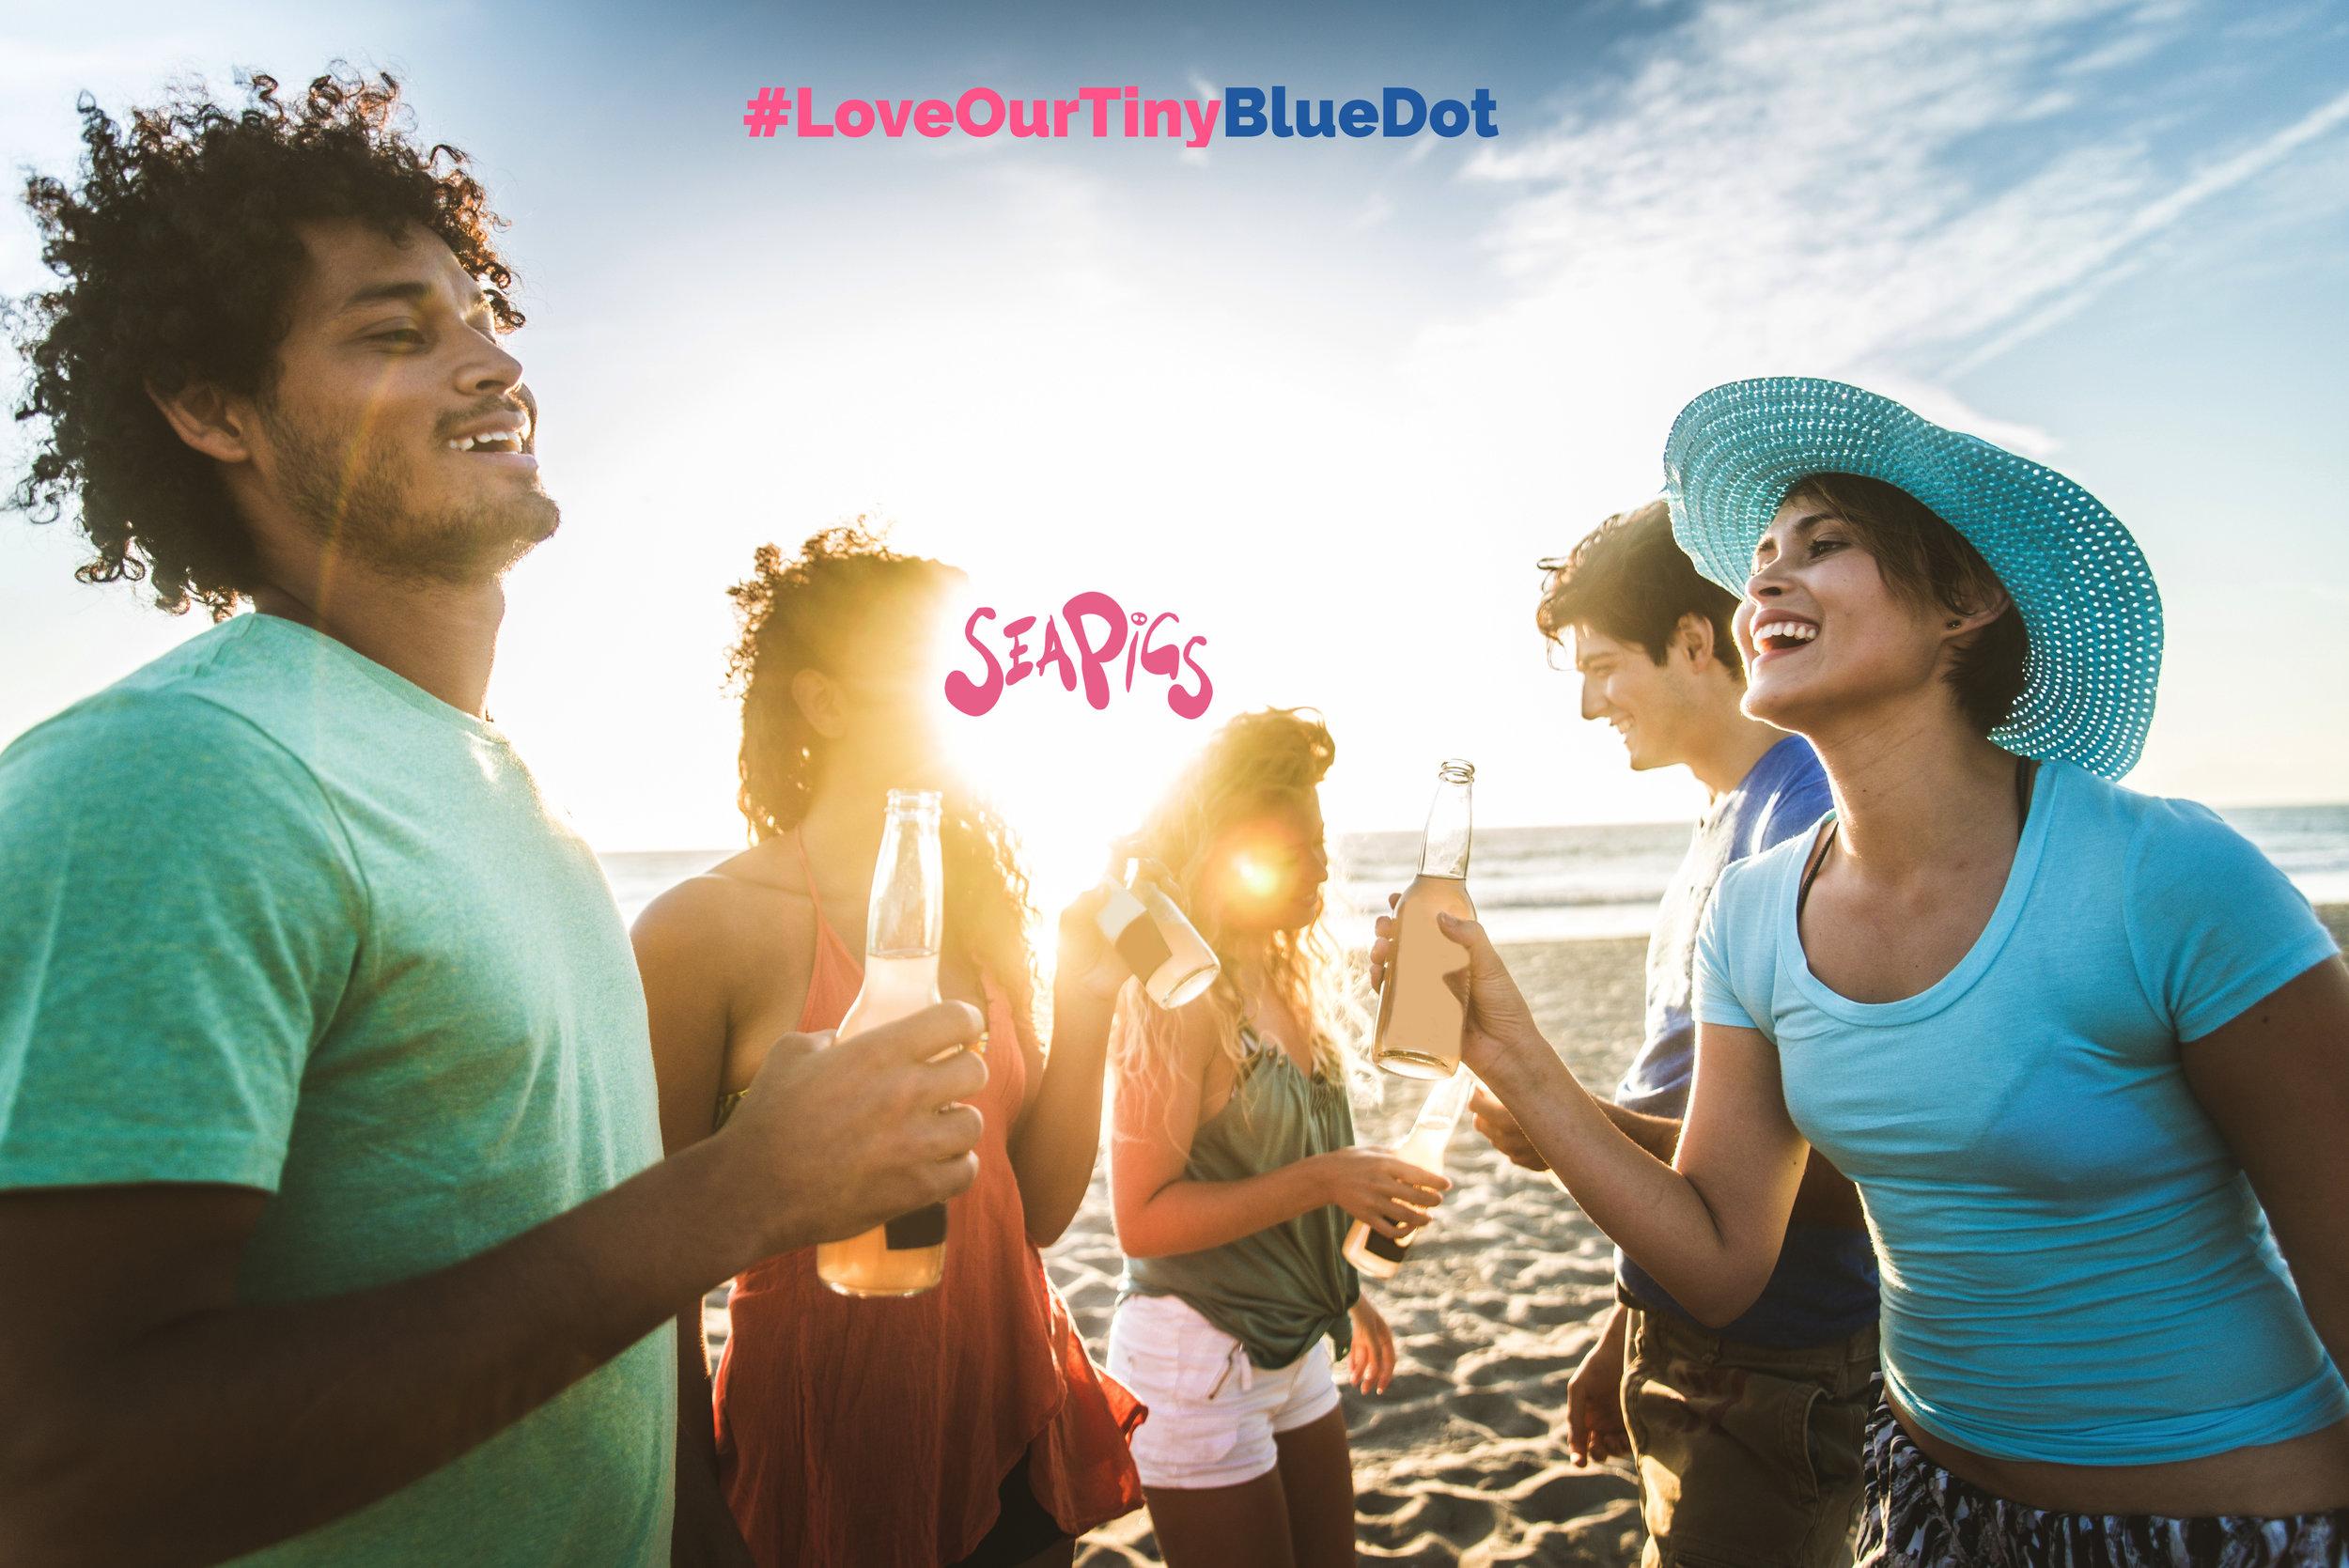 SeaPigs Drifters - Love Our Tiny Blue Dot